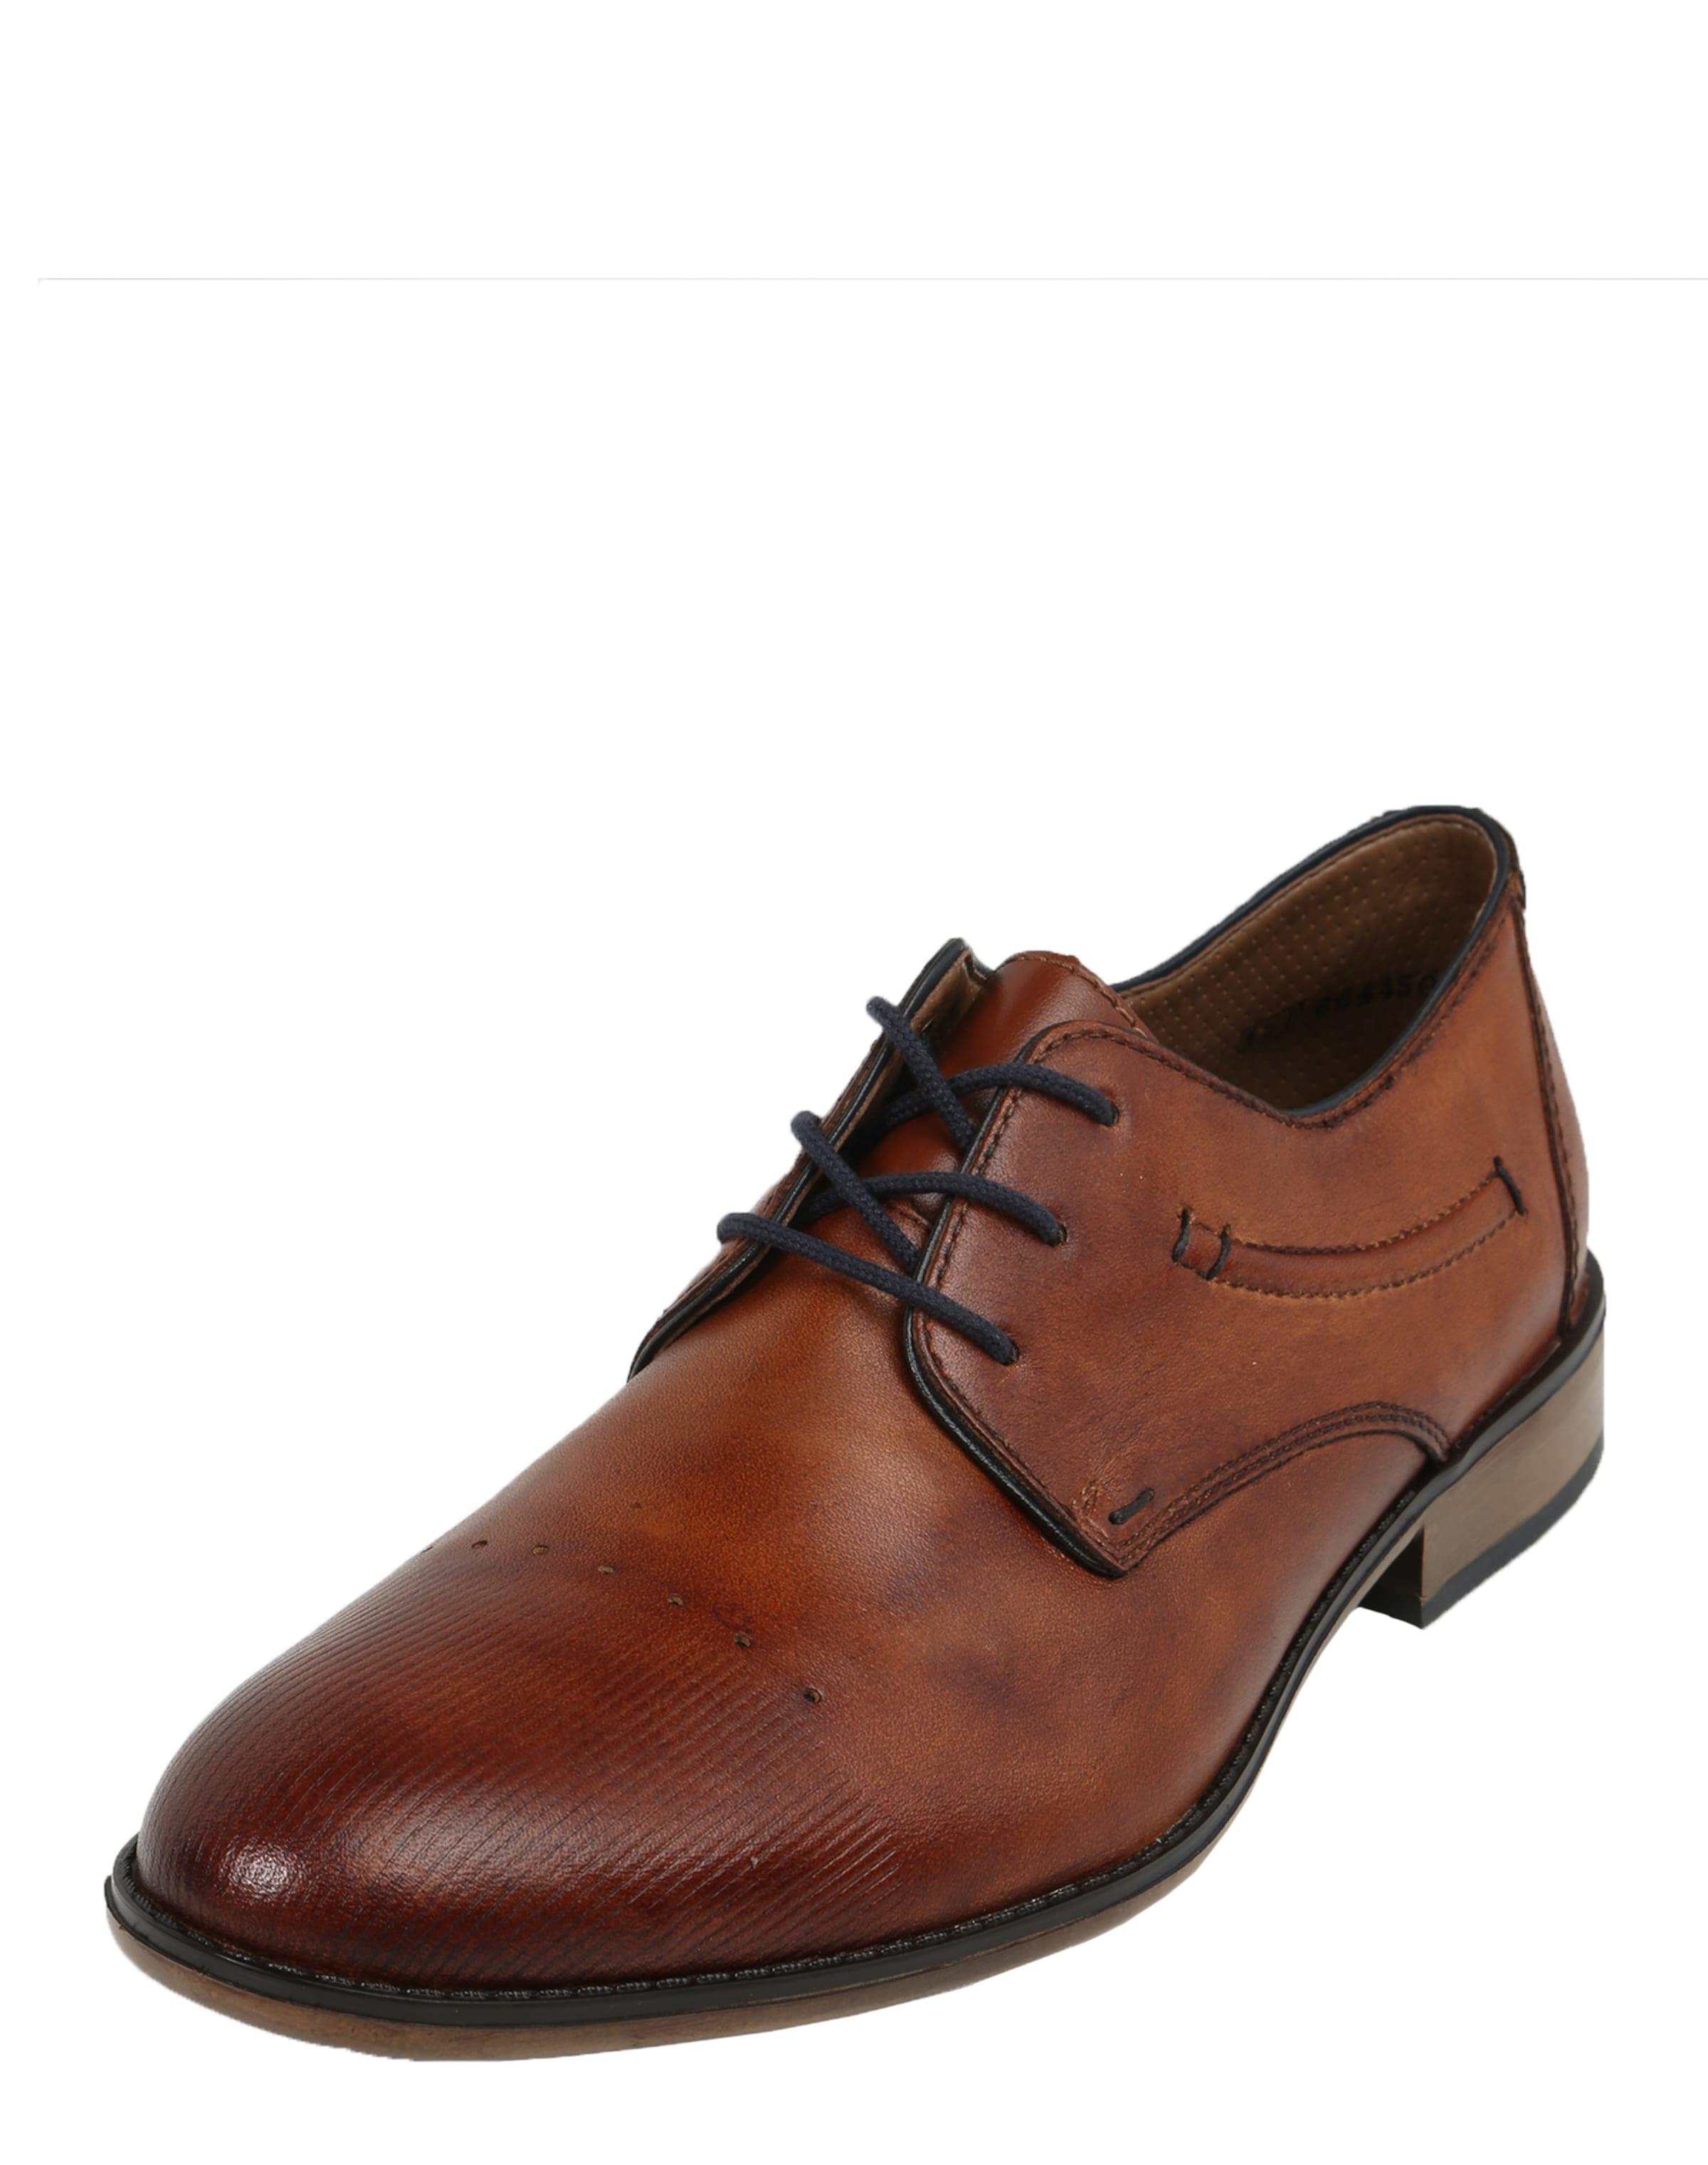 Haltbare Mode billige Schuhe RIEKER | Klassische Schnürschuhe Schuhe Schuhe Schuhe Gut getragene Schuhe 9a983f